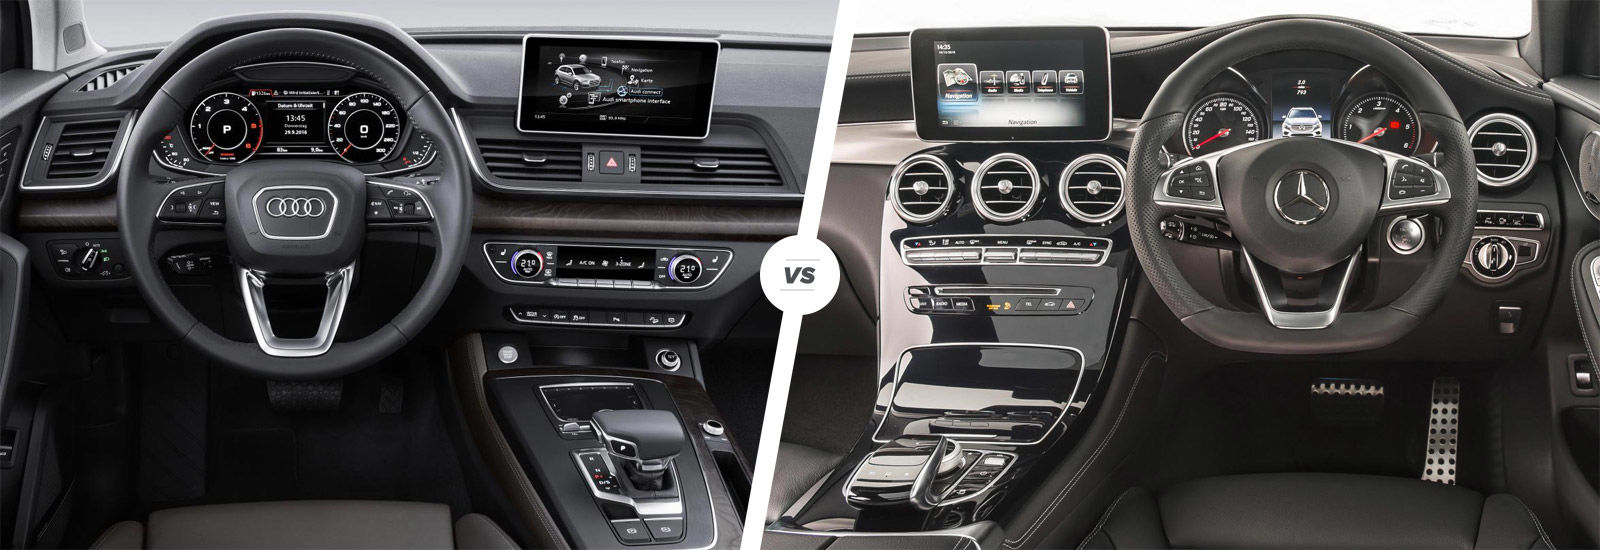 Mercedes GLC vs Audi Q5 SUV comparison | carwow